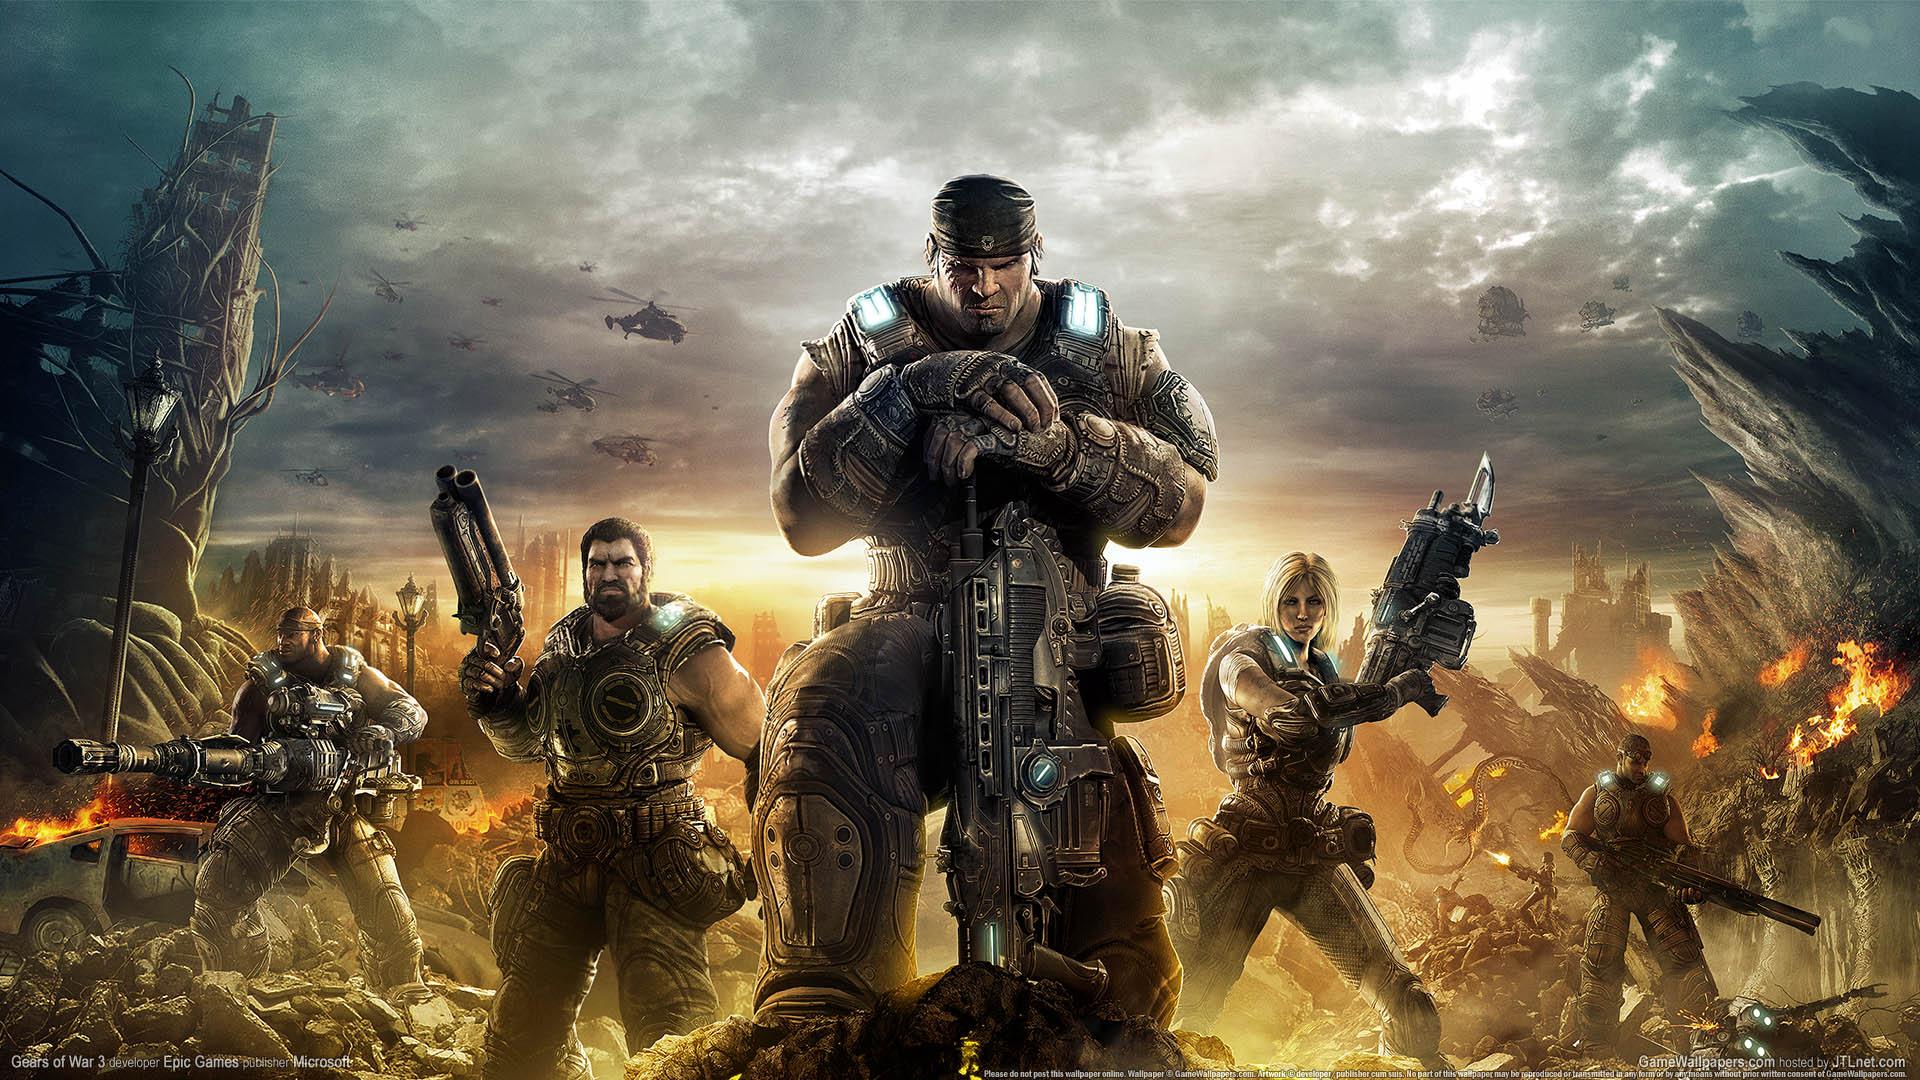 Gears of War 3 Hintergrundbild 01 1920x1080